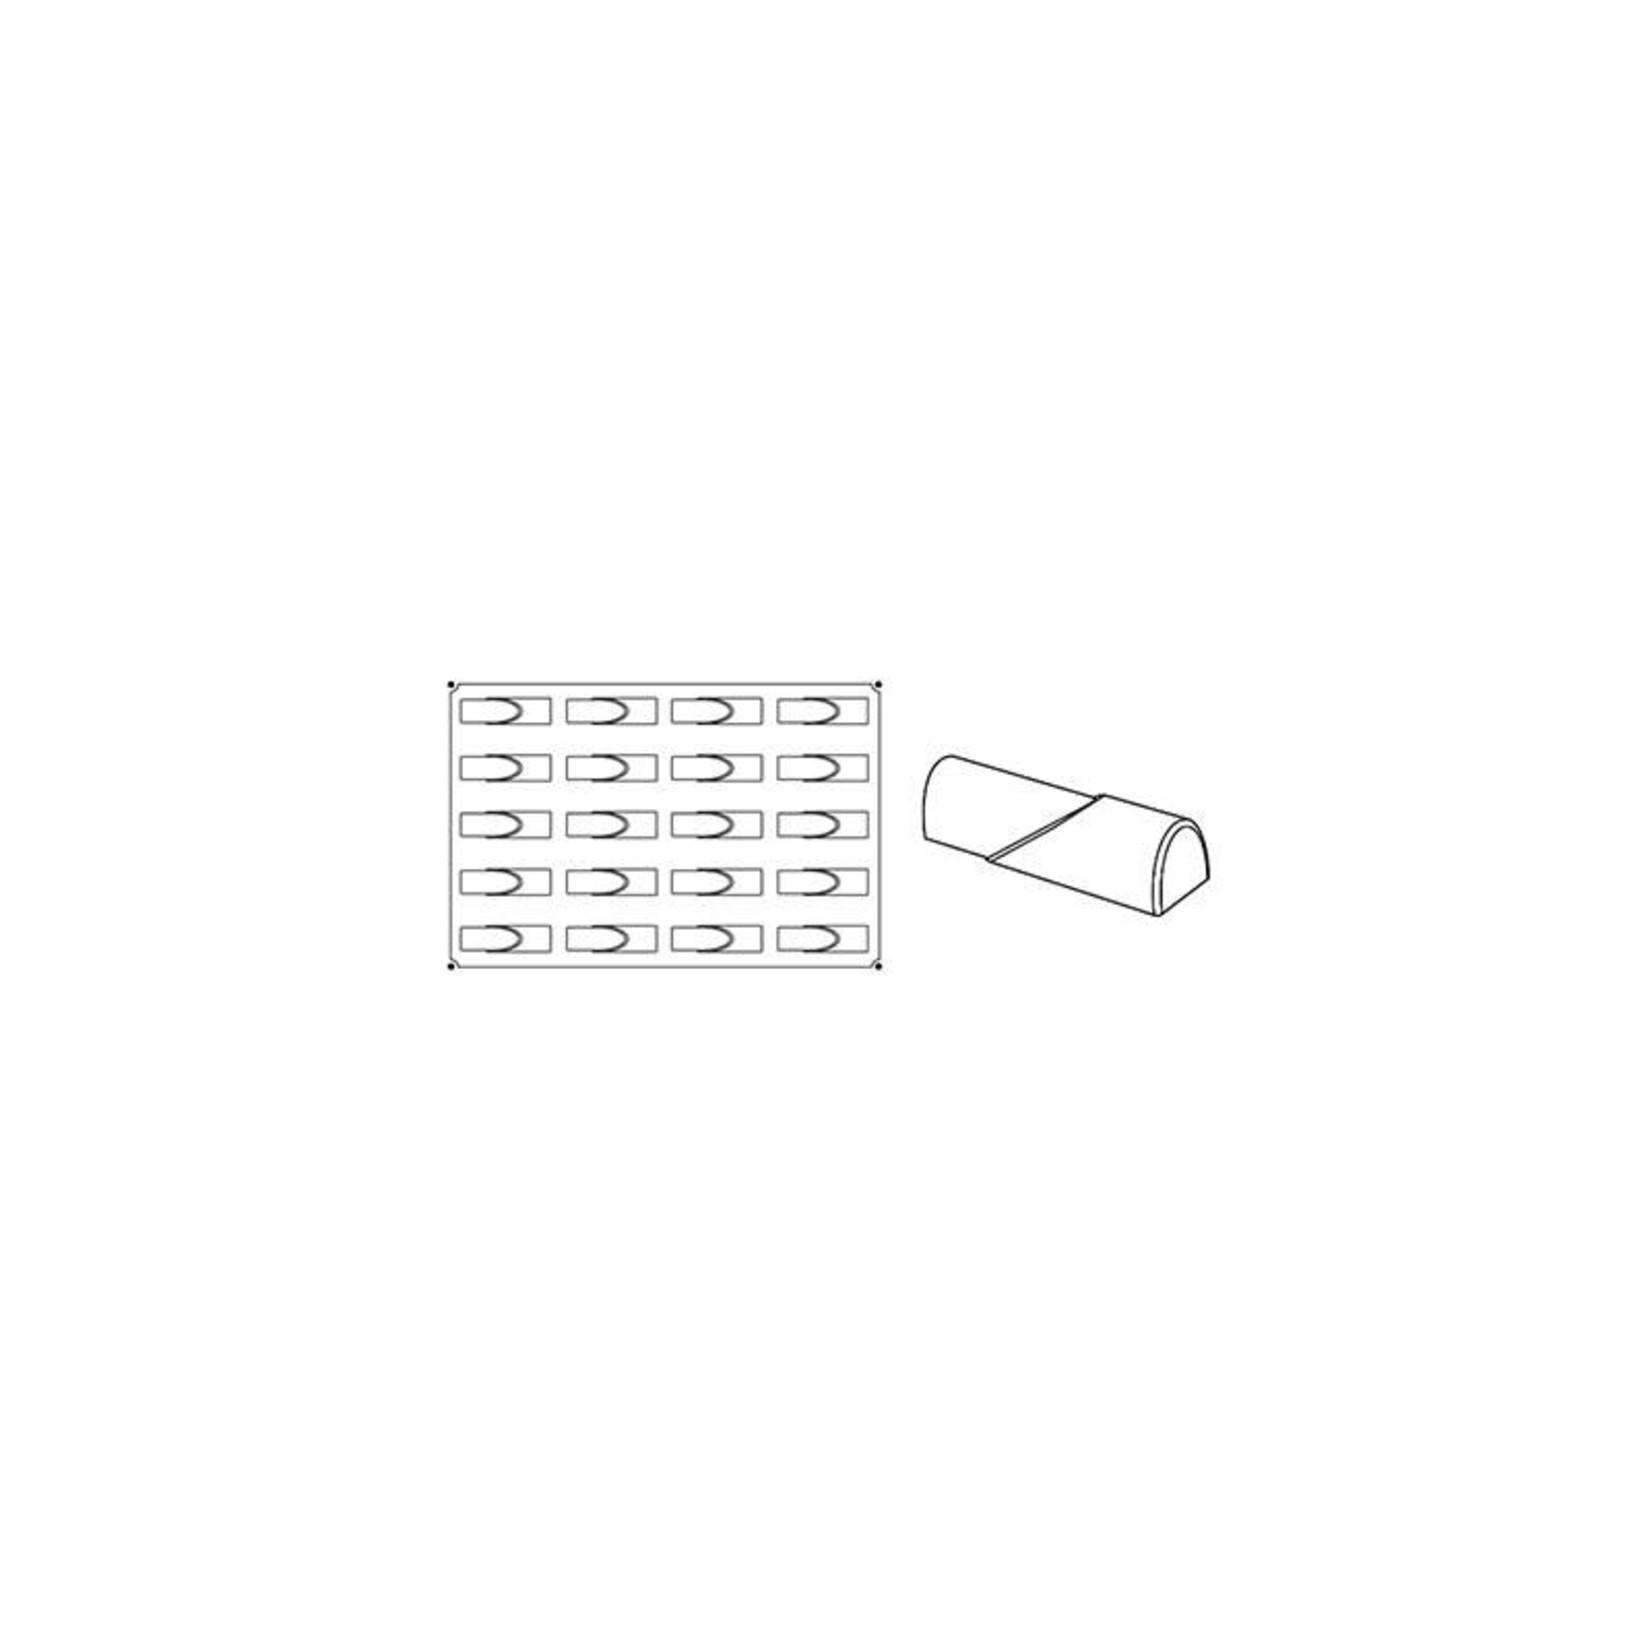 Pavoni Pavoni - Pavoflex silicone mold, Flow, Monoporzione (20 cavity), PX024